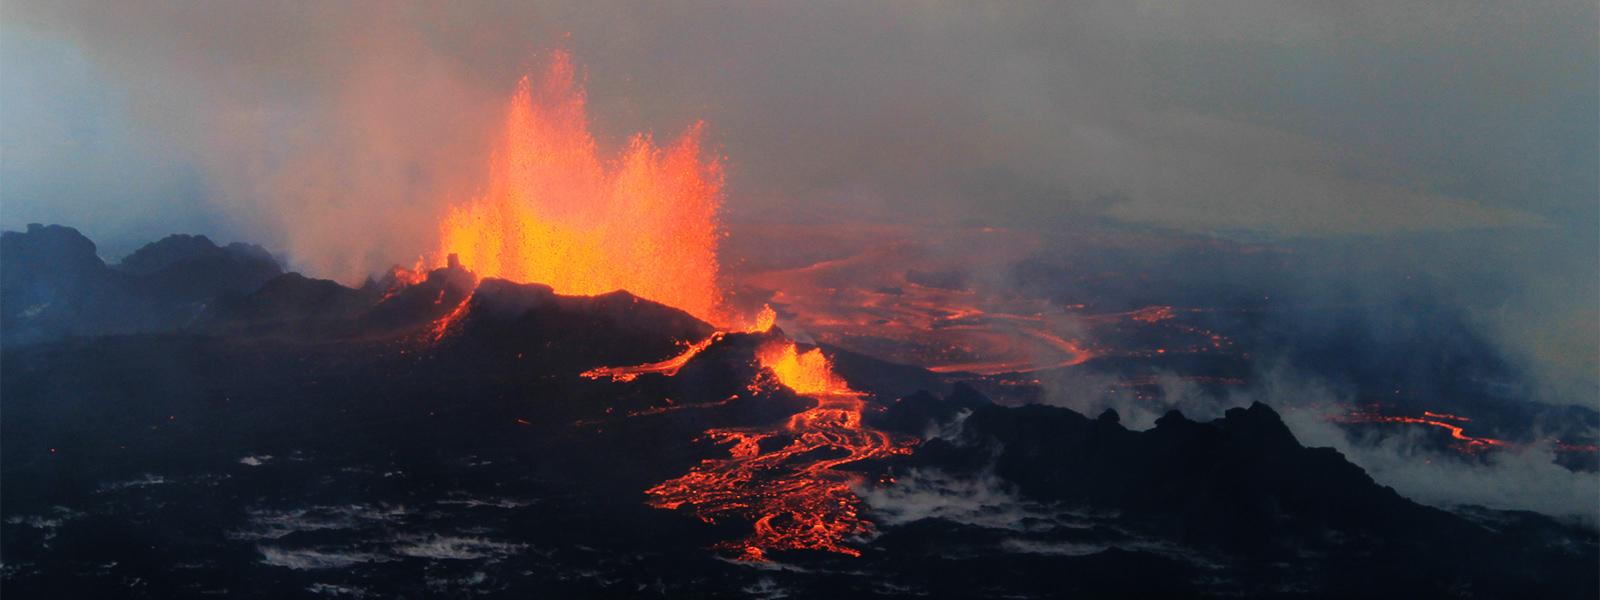 http vulkan one